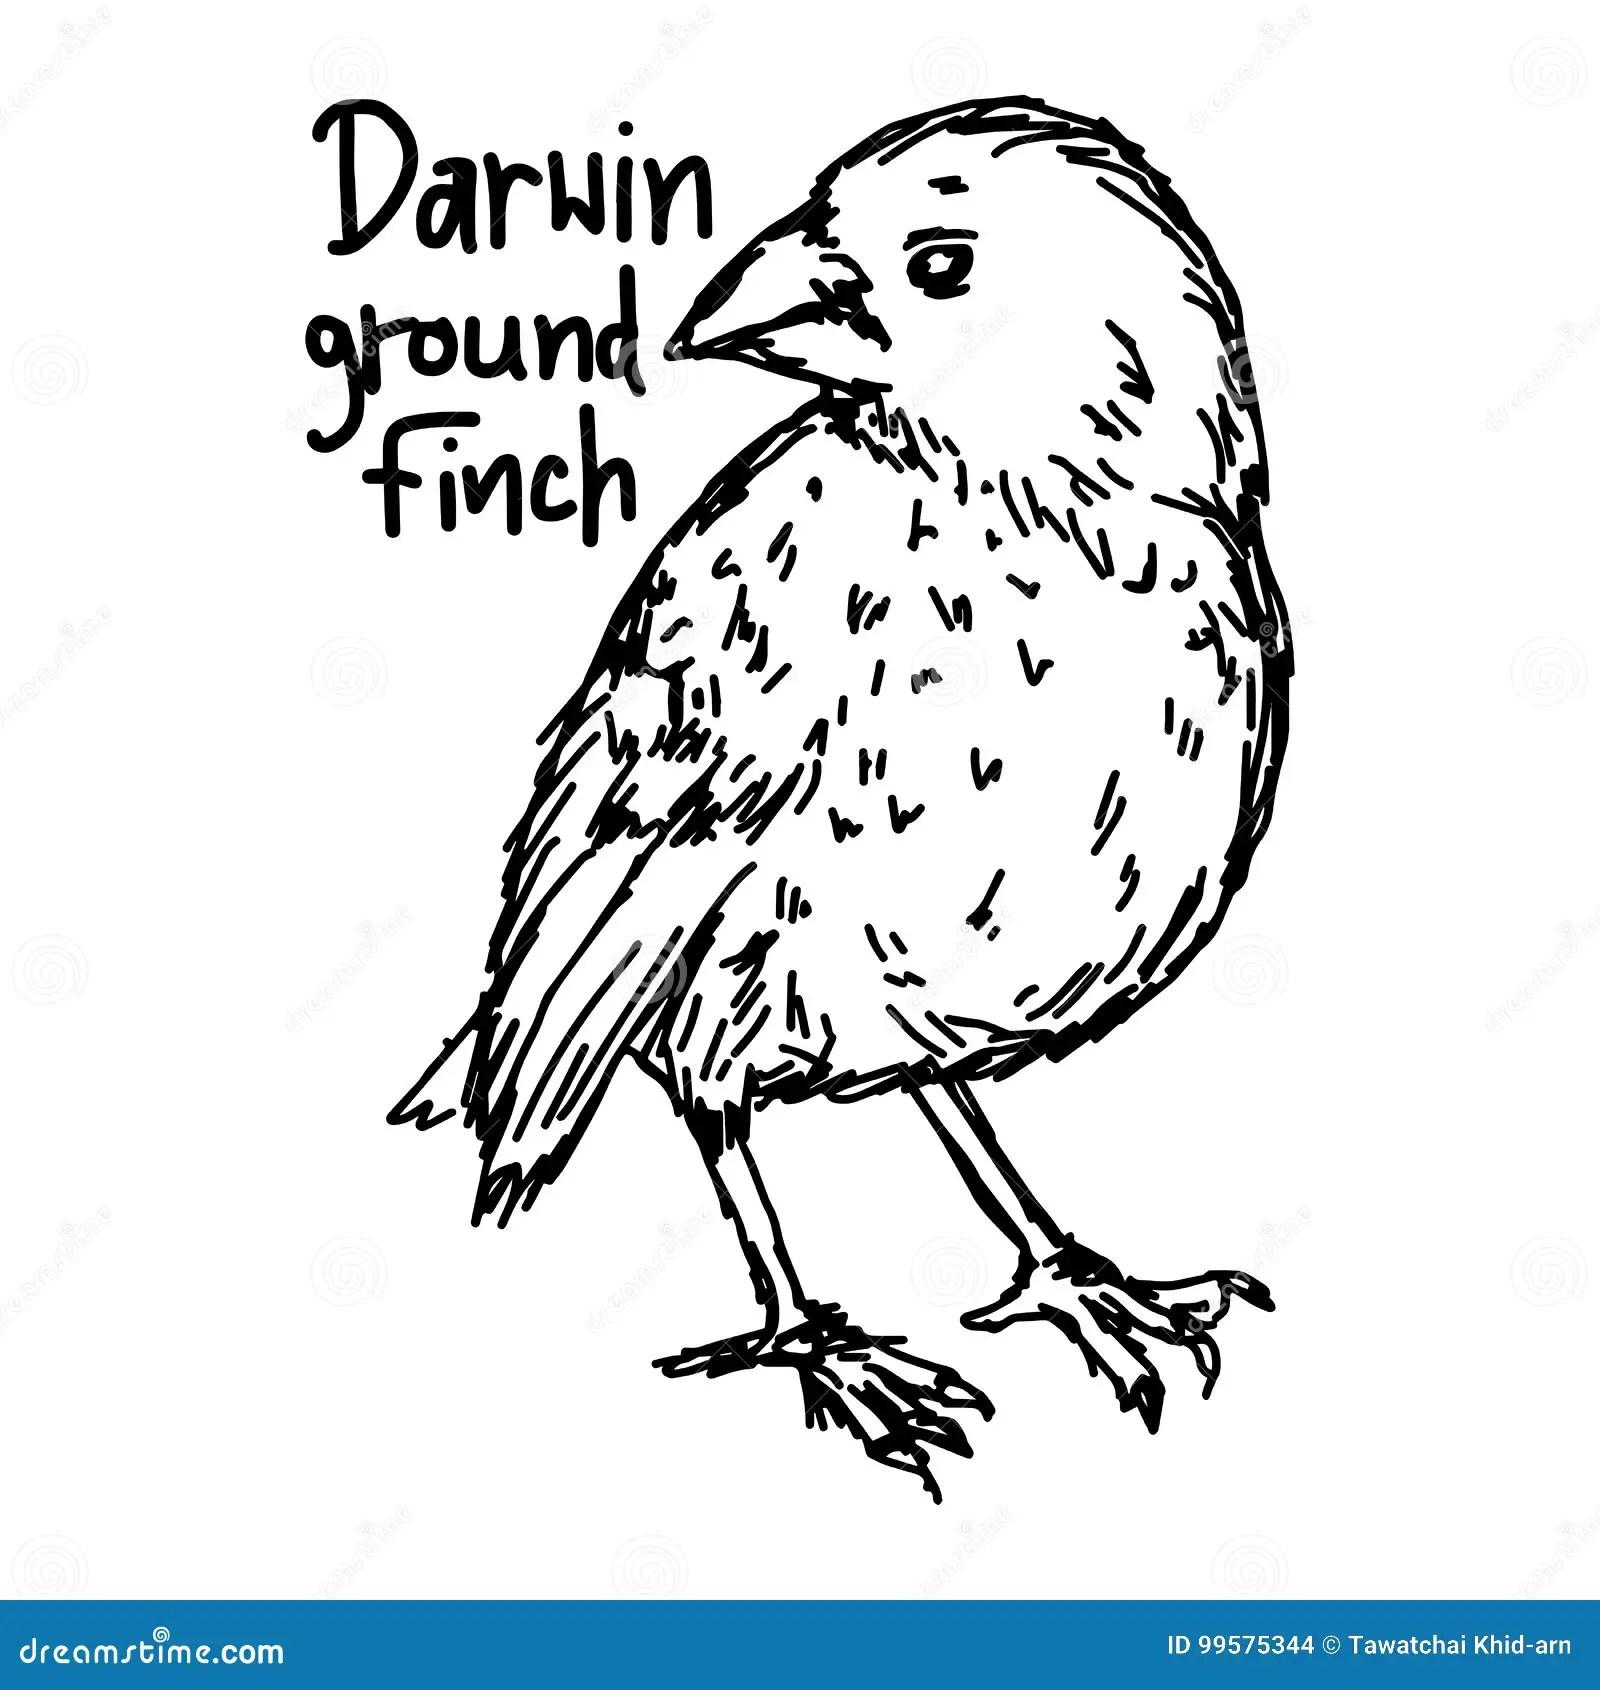 Darwin Ground Finch